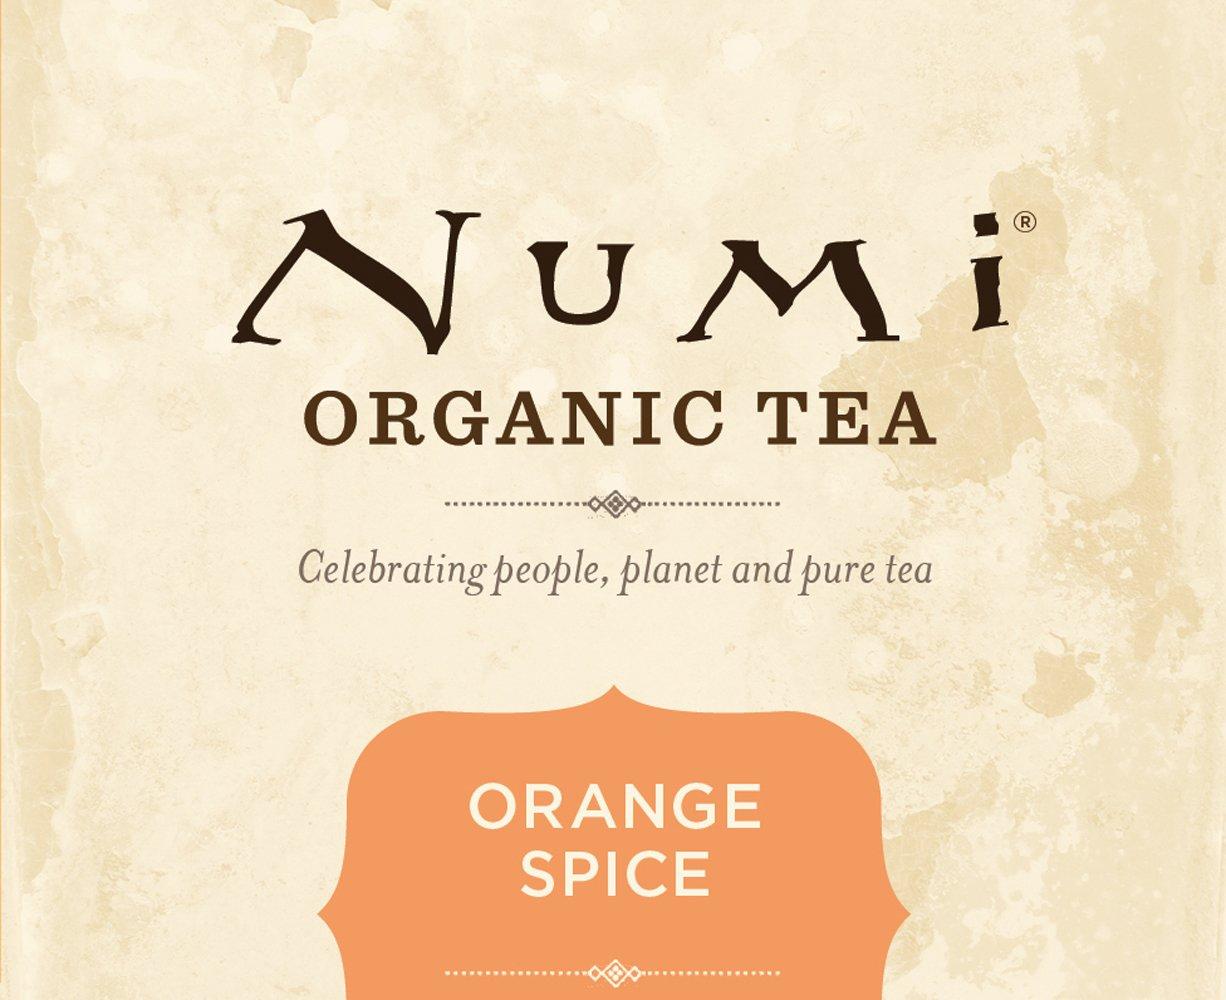 Numi Organic Tea White Orange Spice, Full Leaf White Tea, 16-Count Tea Bags, 1.58 Oz  (Pack of 2) by Numi Organic Tea (Image #5)